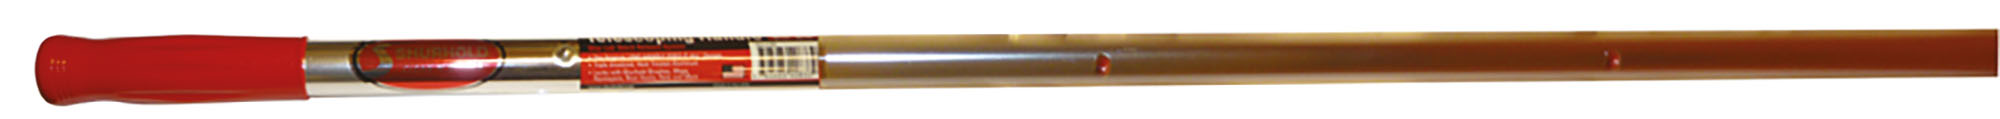 MANICO TELESCOPICO SHURHOLD 109-182 CM